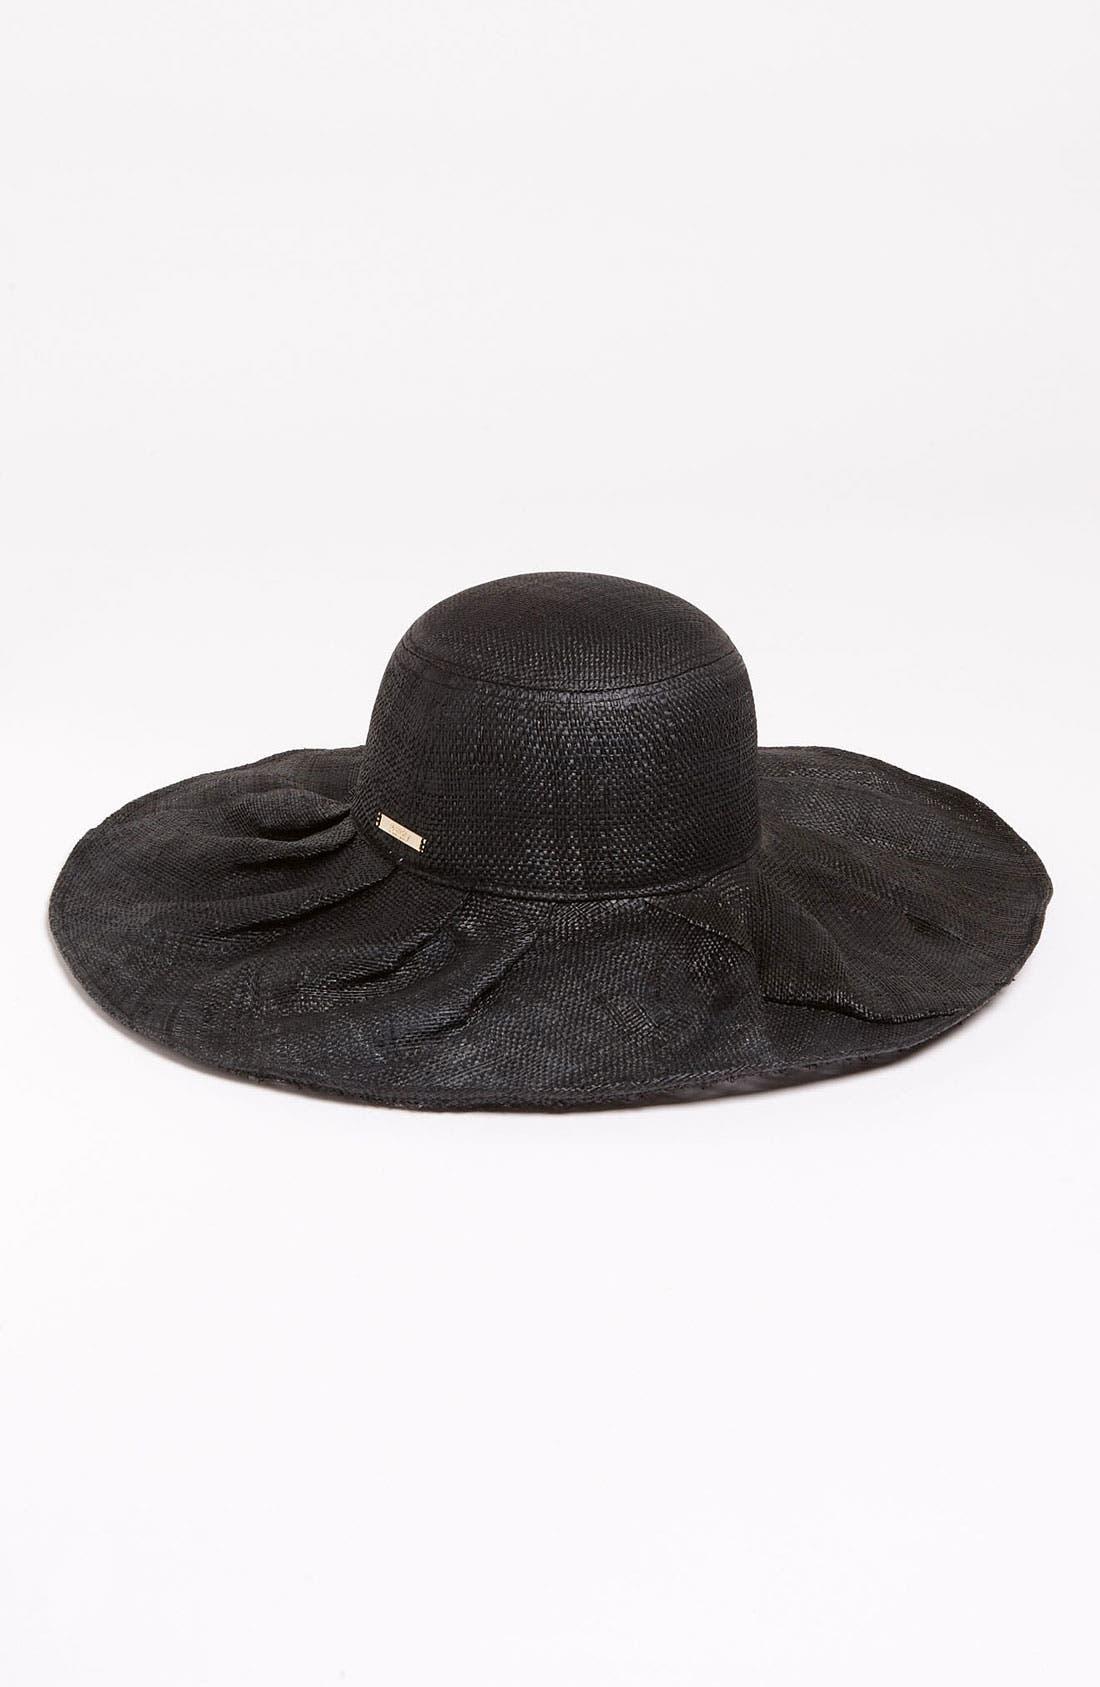 Main Image - Laundry by Shelli Segal 'Jovanna' Straw Sun Hat